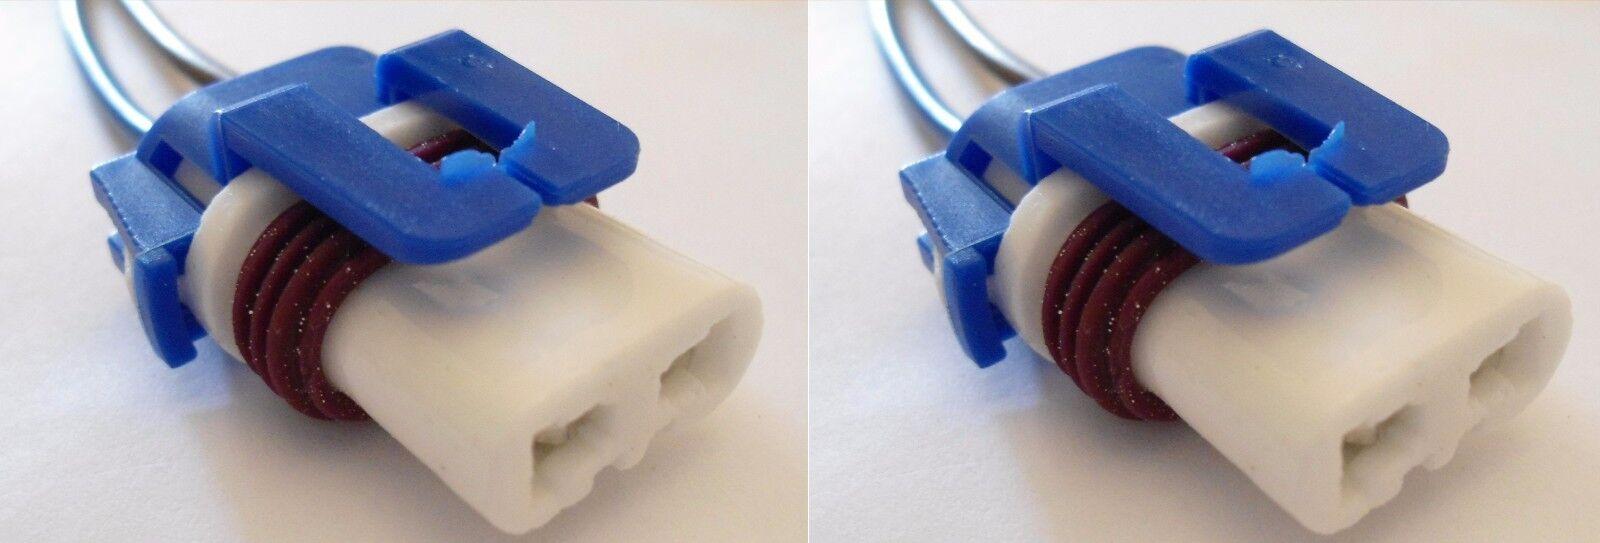 2 X 9005 Hb3 Female Ceramic Bulb Socket Pigtail Connector Halogen Wiring An Outlet Headlamp Light